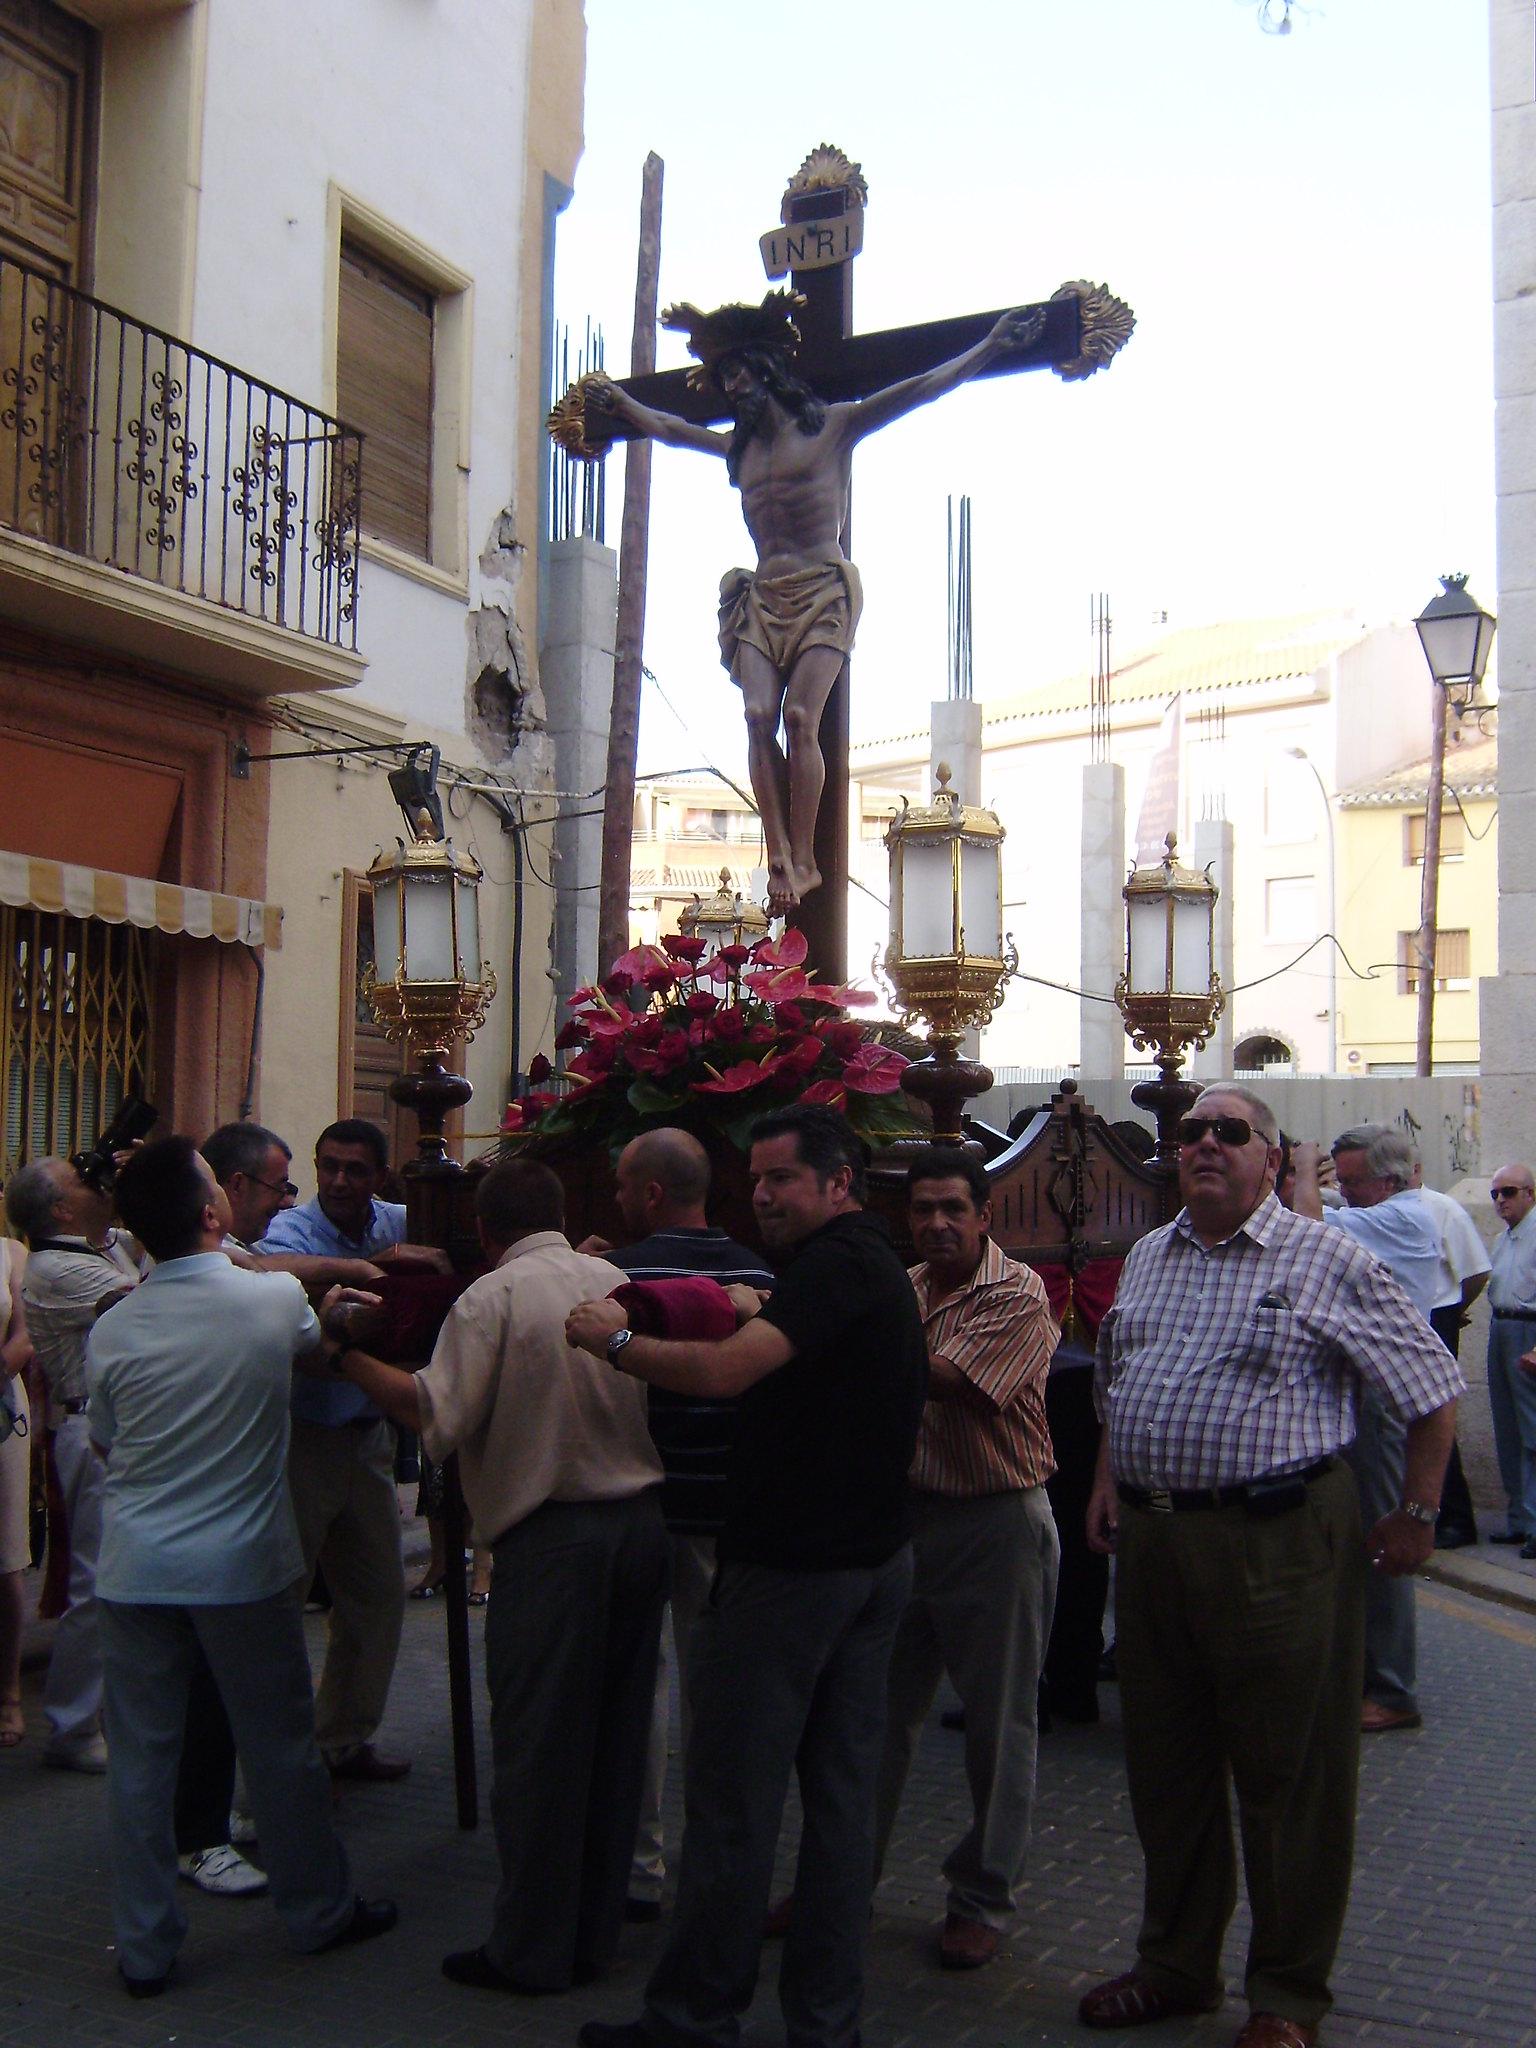 (2009-07-05) - Procesión Subida - Javier Romero Ripoll - (03)